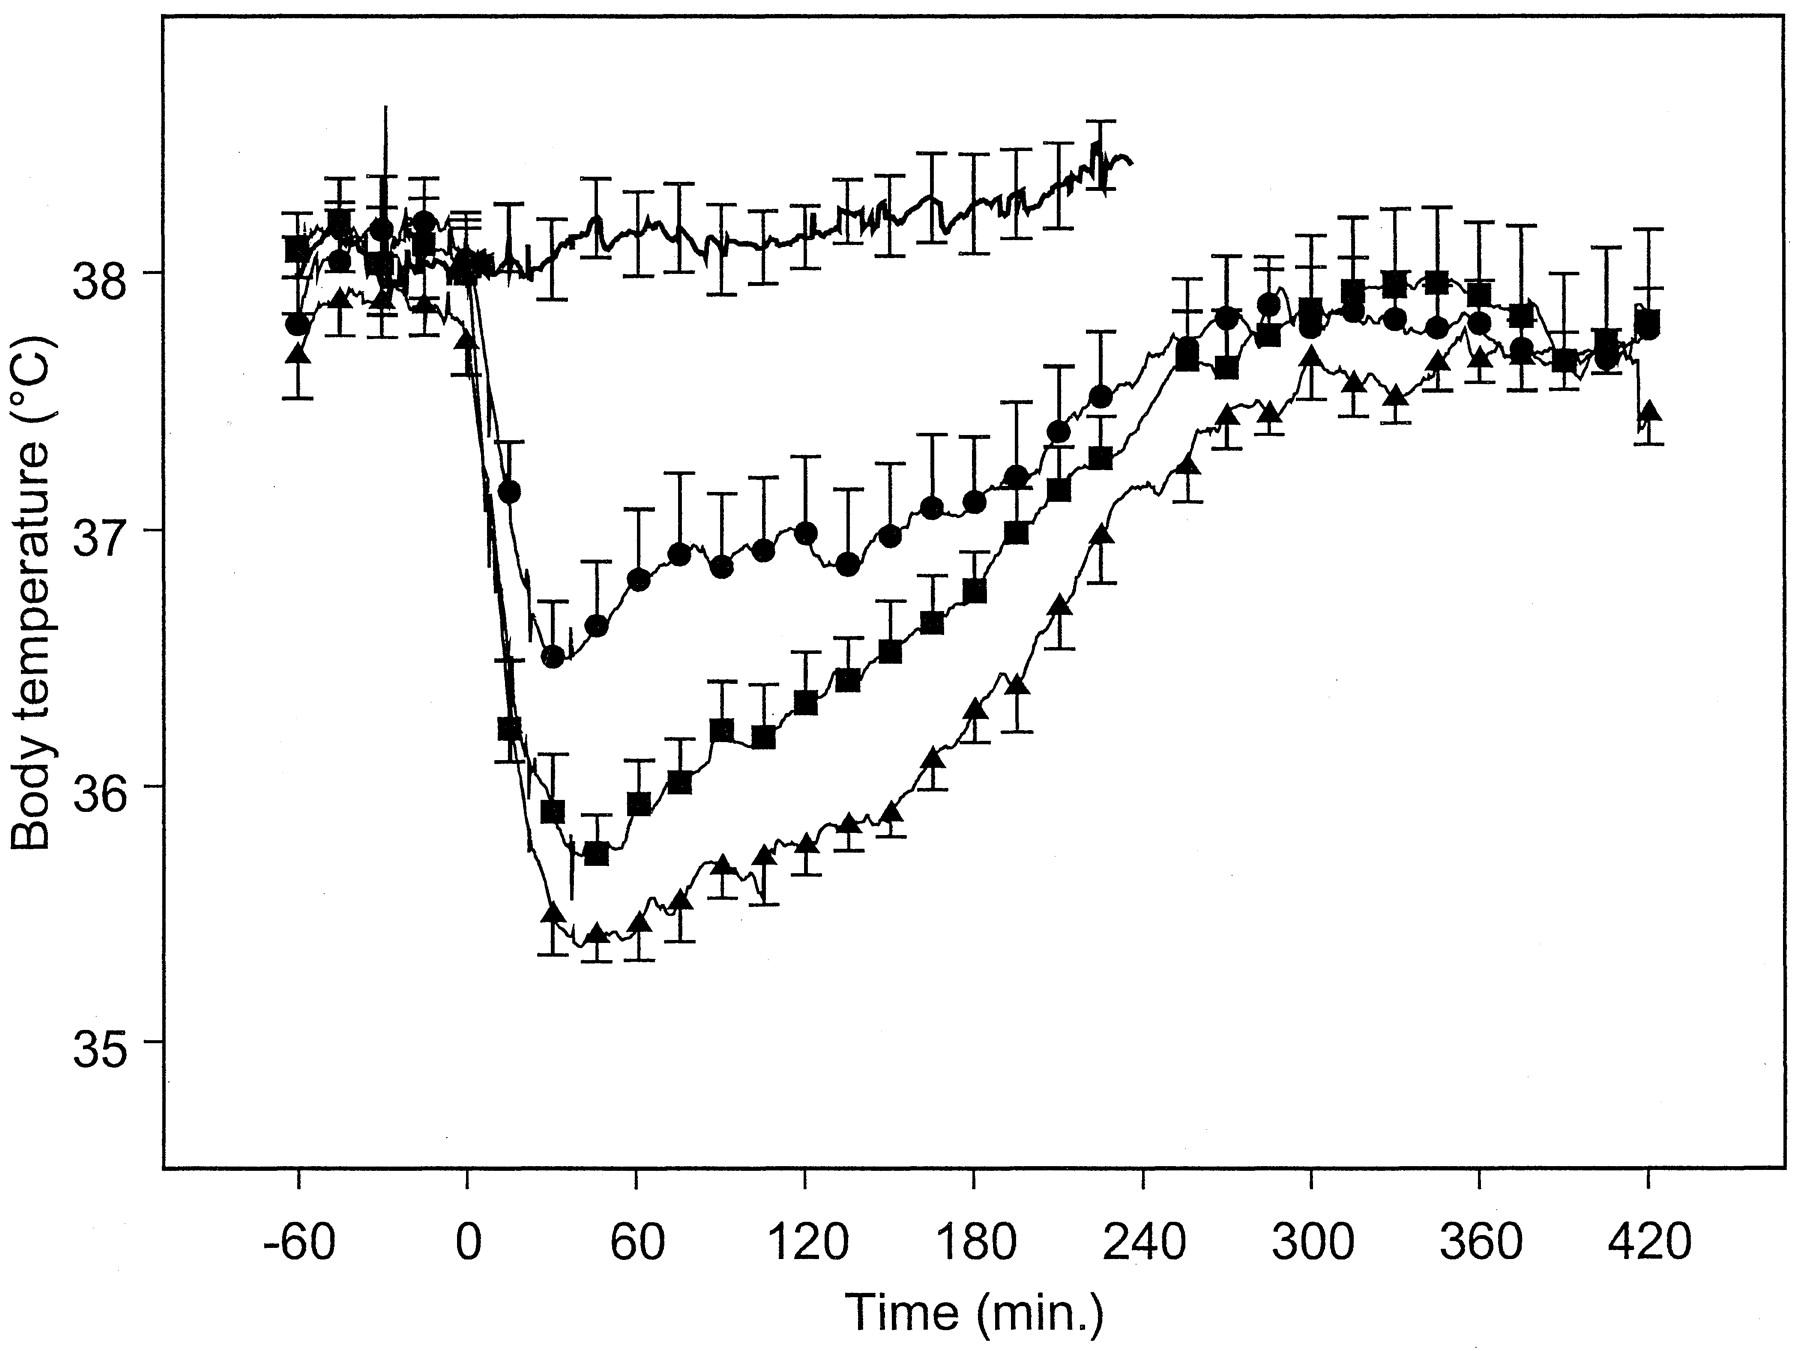 Pharmacokinetic-Pharmacodynamic Modeling of Buspirone and